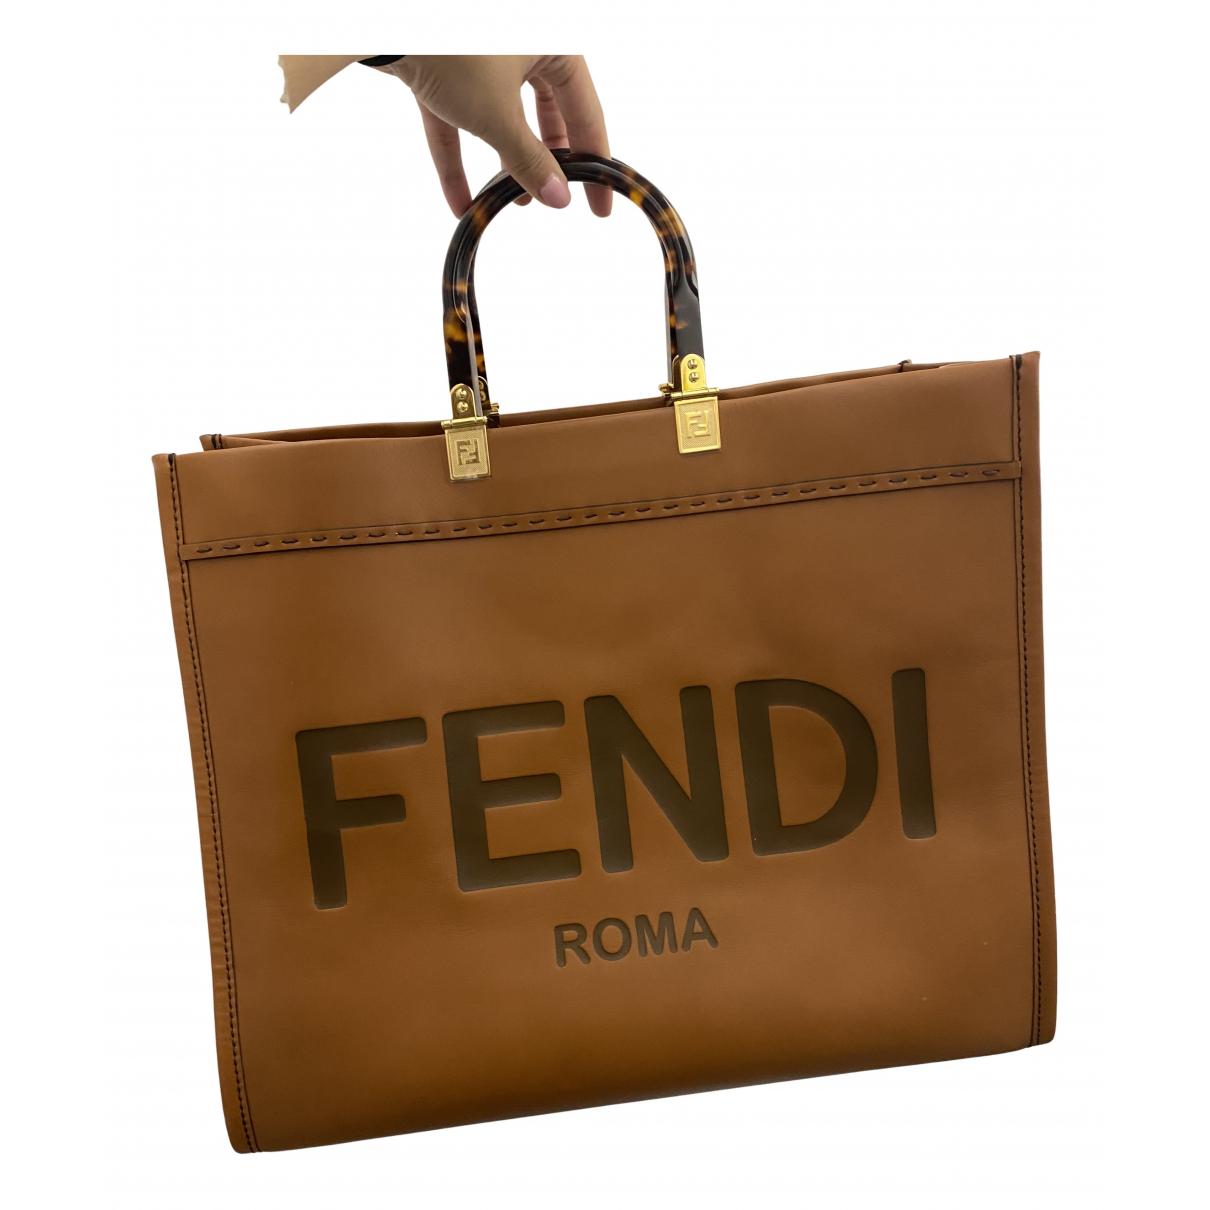 Fendi Logo Shopper Tote Brown Leather Handbag for Women